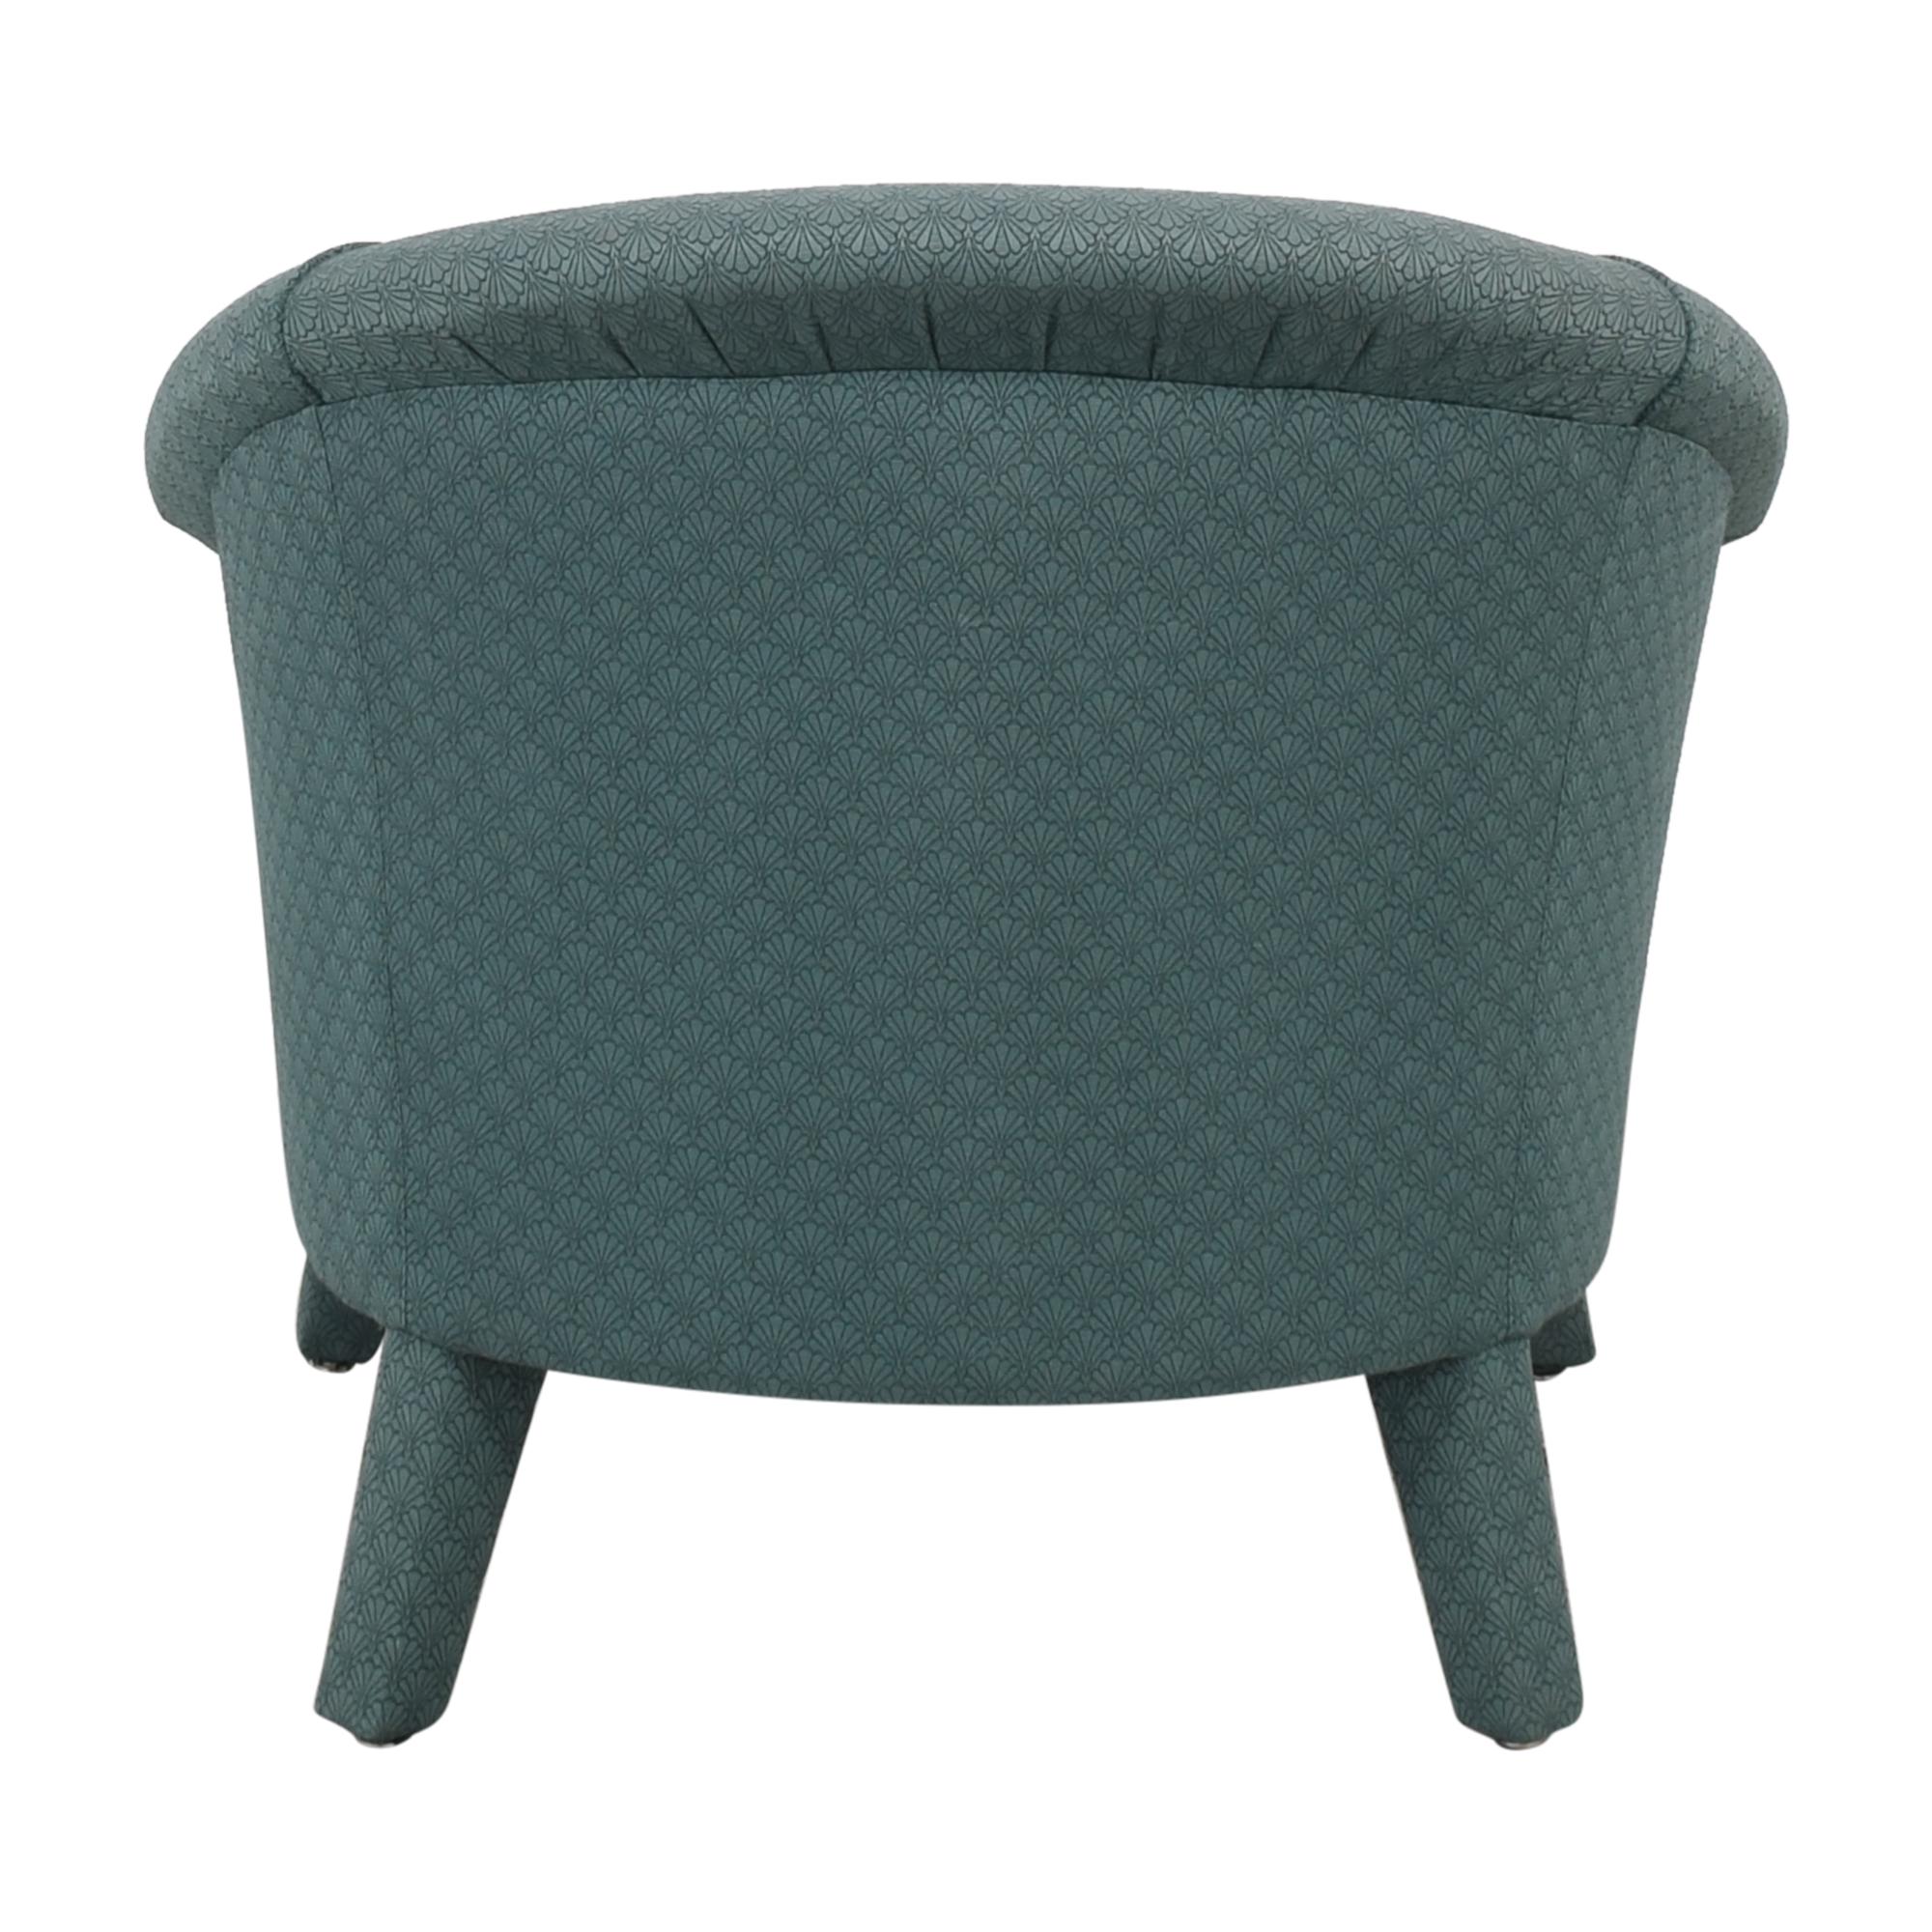 Crate & Barrel Crate & Barrel Upholstered Armchair dimensions